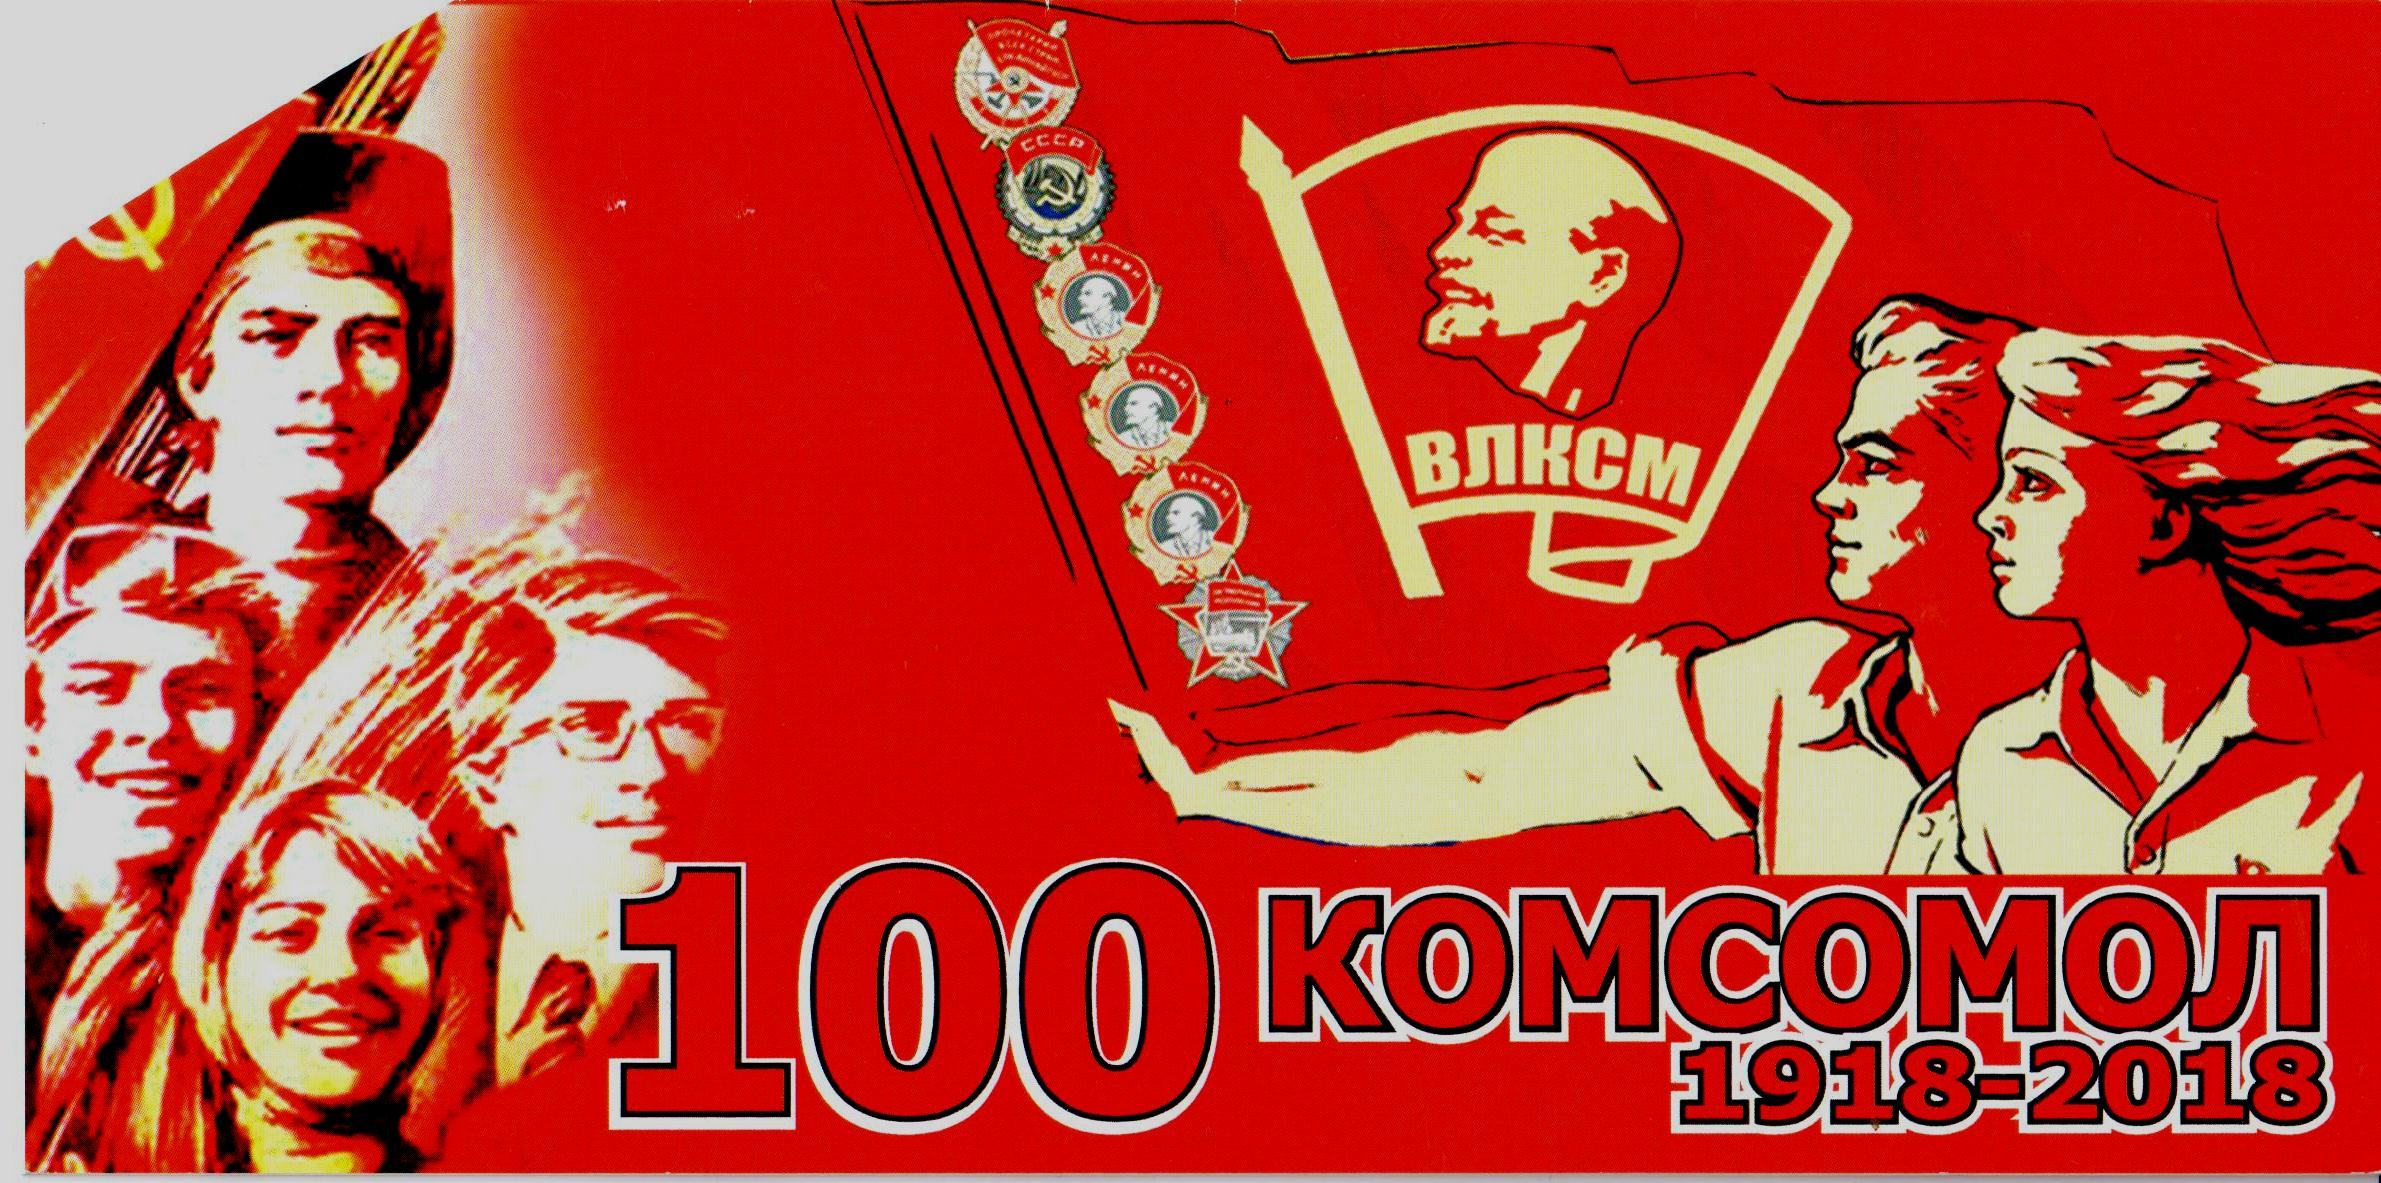 Картинки, открытка 100 летие комсомола